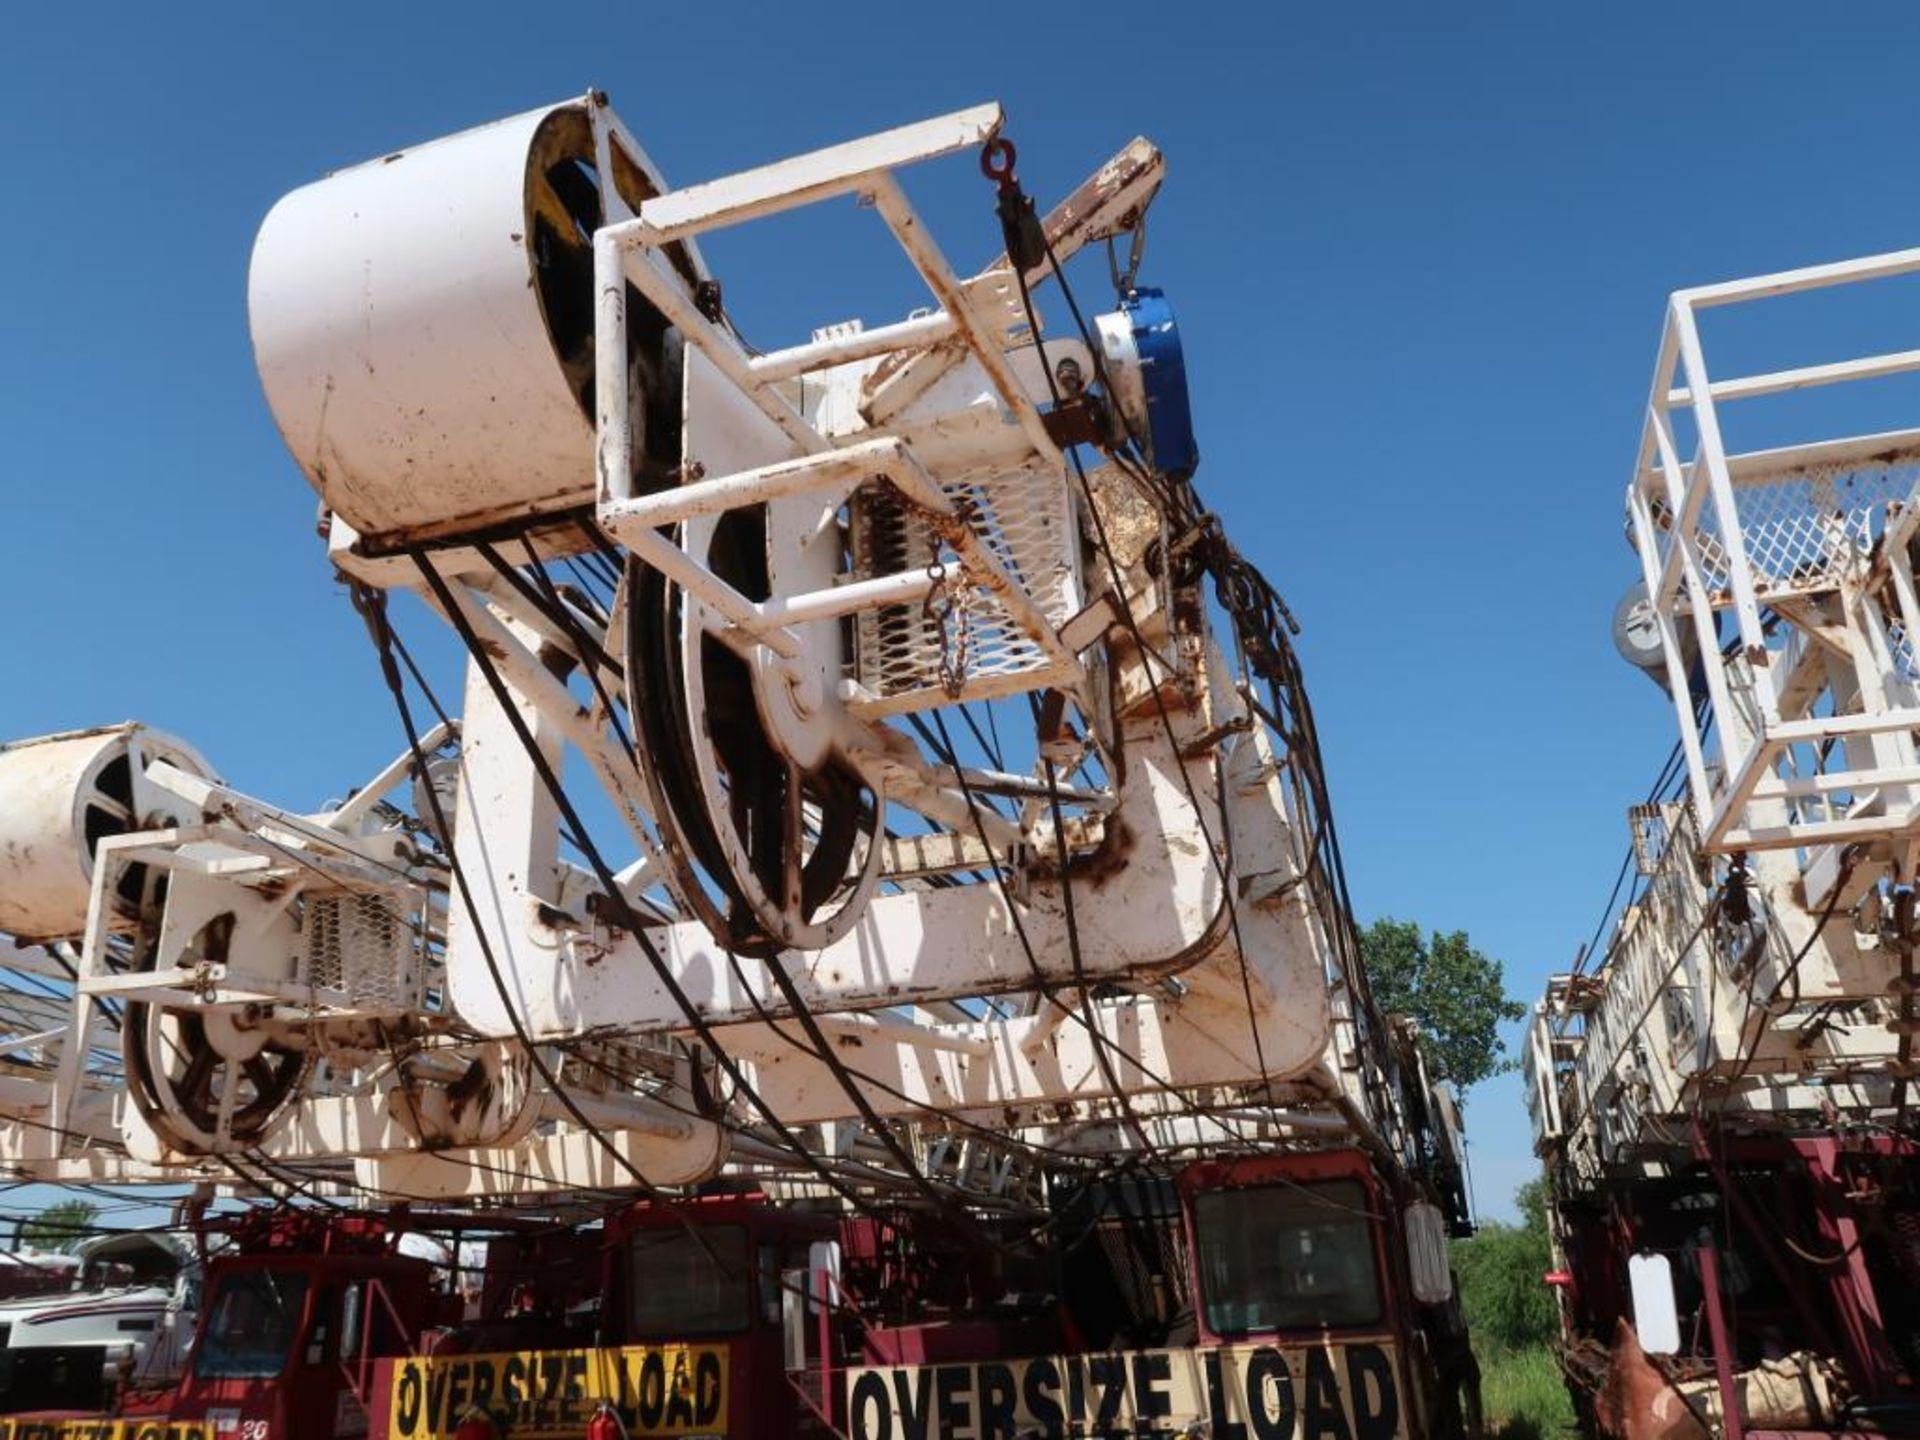 Lot 260 - Rig 30: Franks 1287-160 5-Axle Well Service Rig, Detroit S-60, 5860 Transmission, 108 ft. 250 lb. De